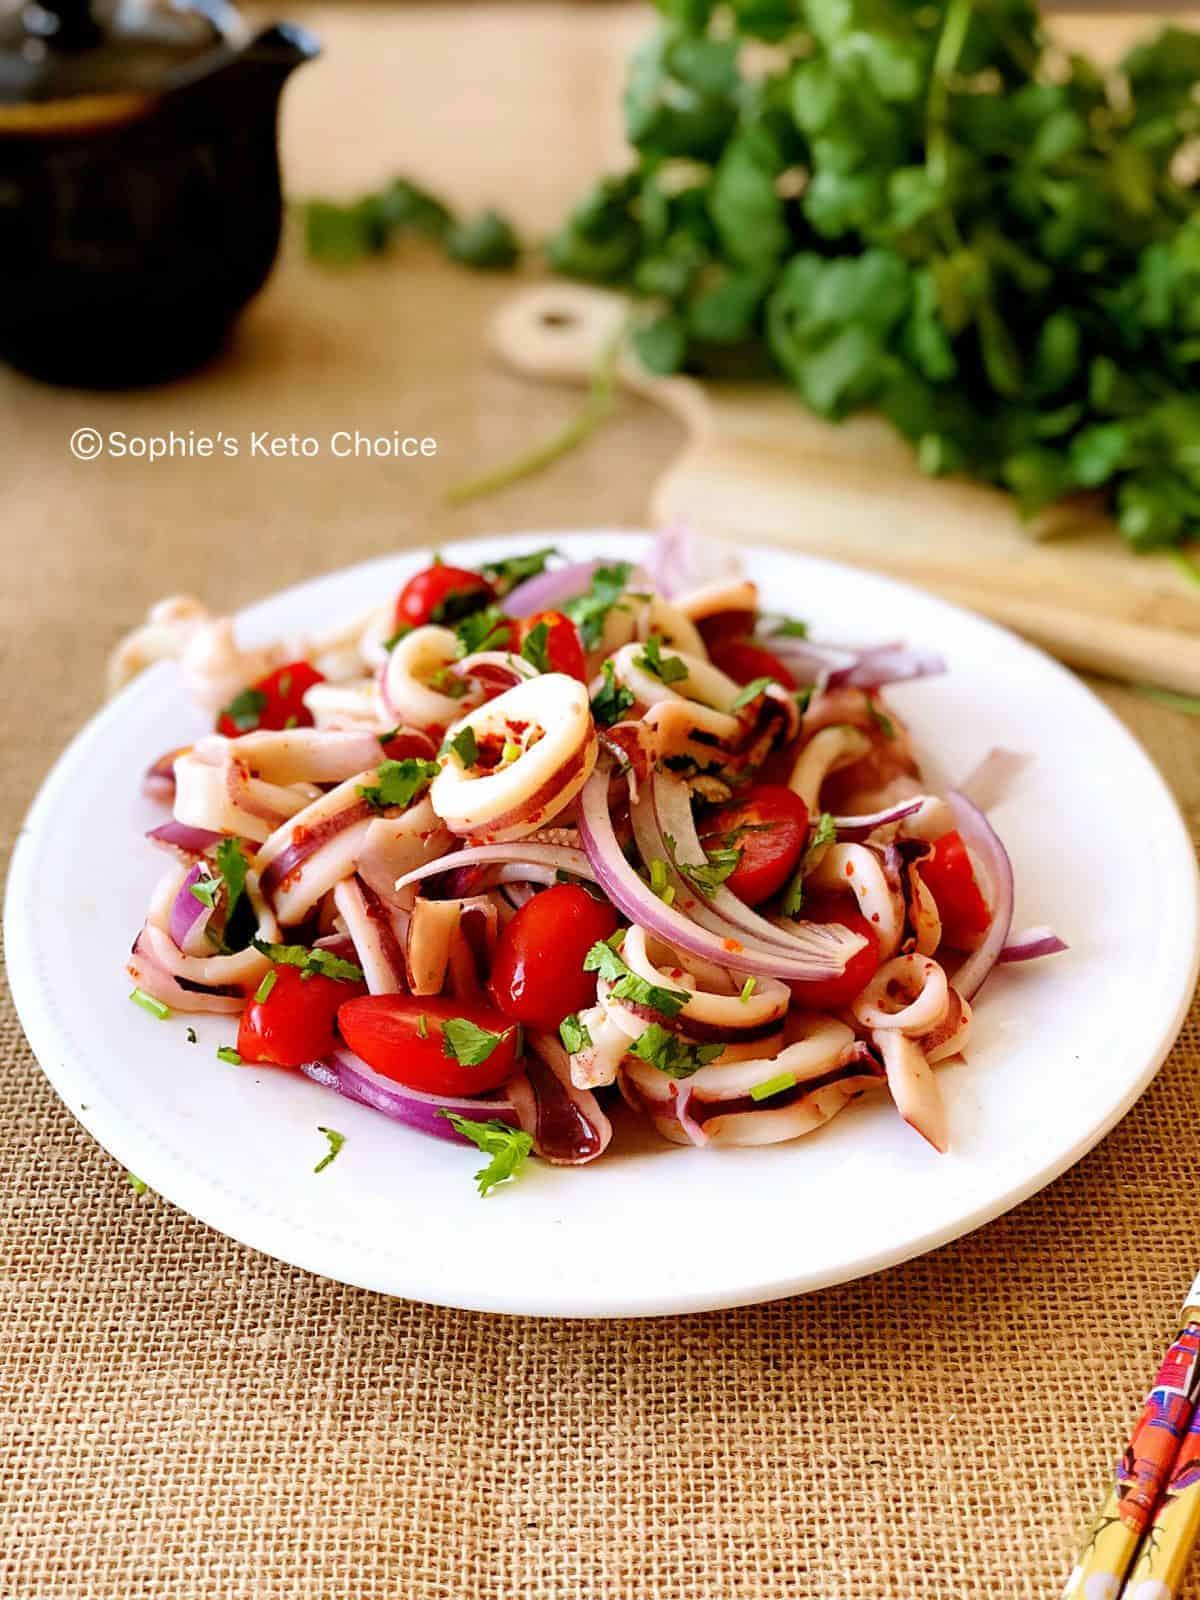 泰式涼拌花枝 Thai Sour & Spicy Squid Salad- 酸辣開胃,10分鐘搞定